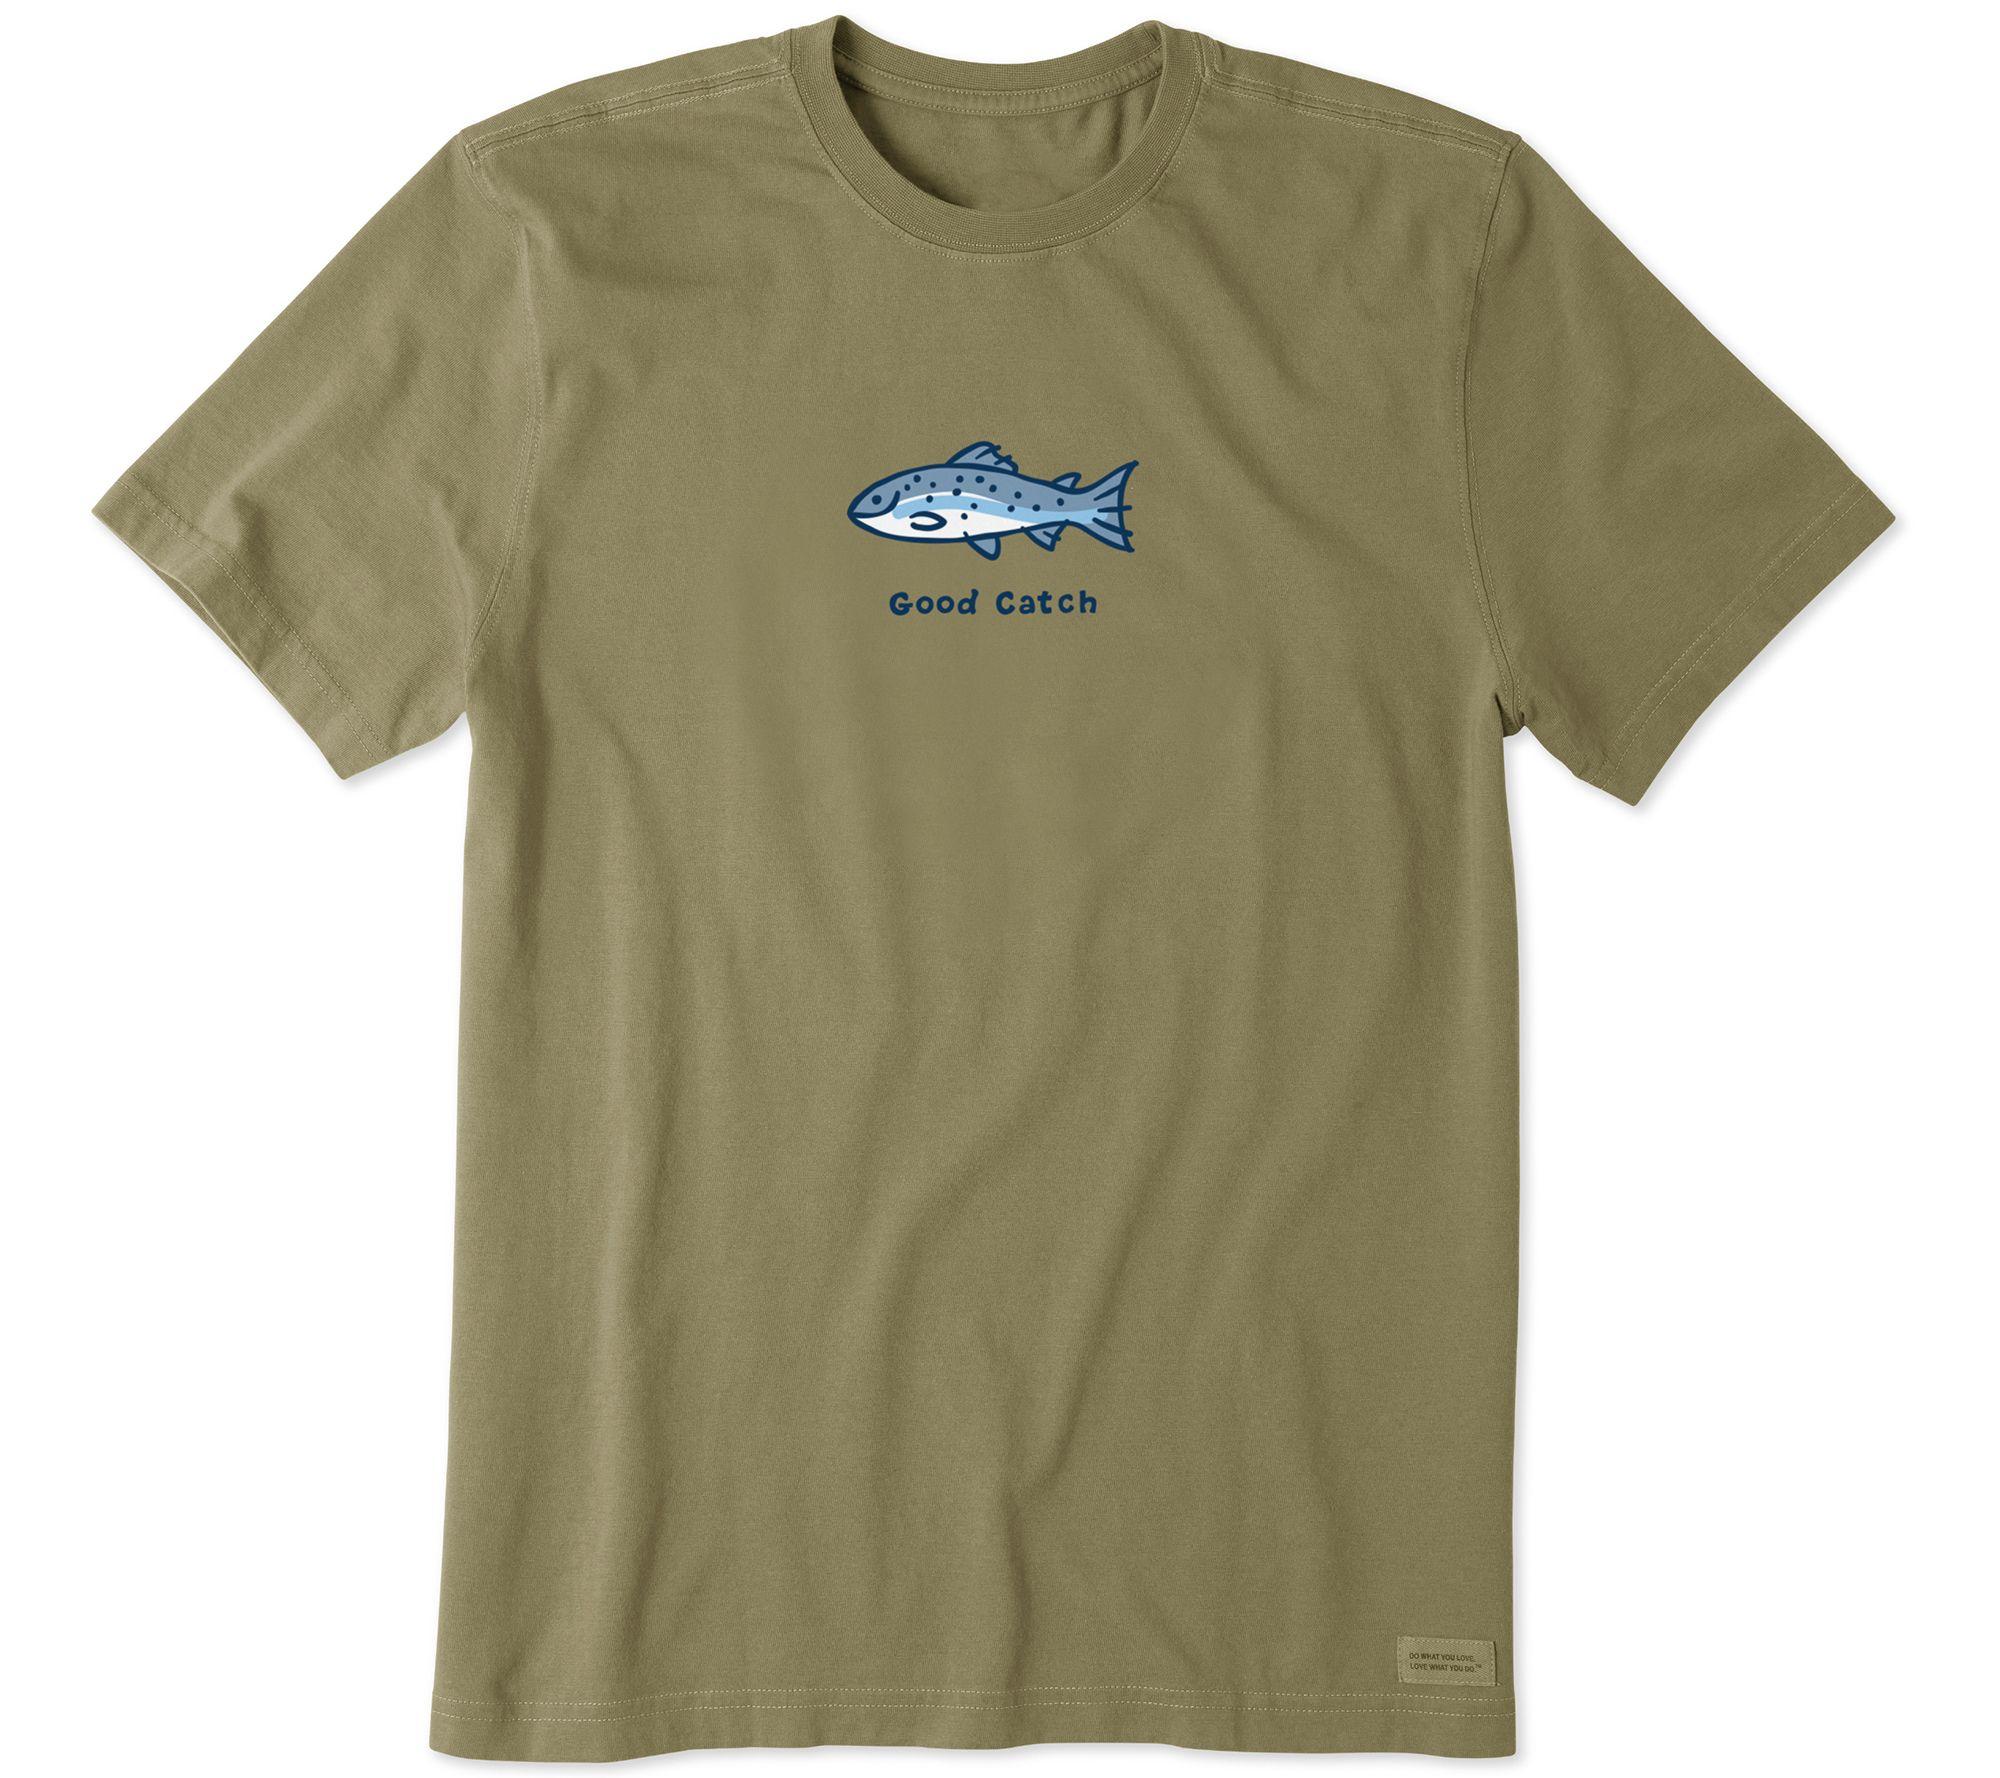 a5d16bdd0556 Life is Good Men s Vintage Good Catch Crusher T-Shirt — QVC.com